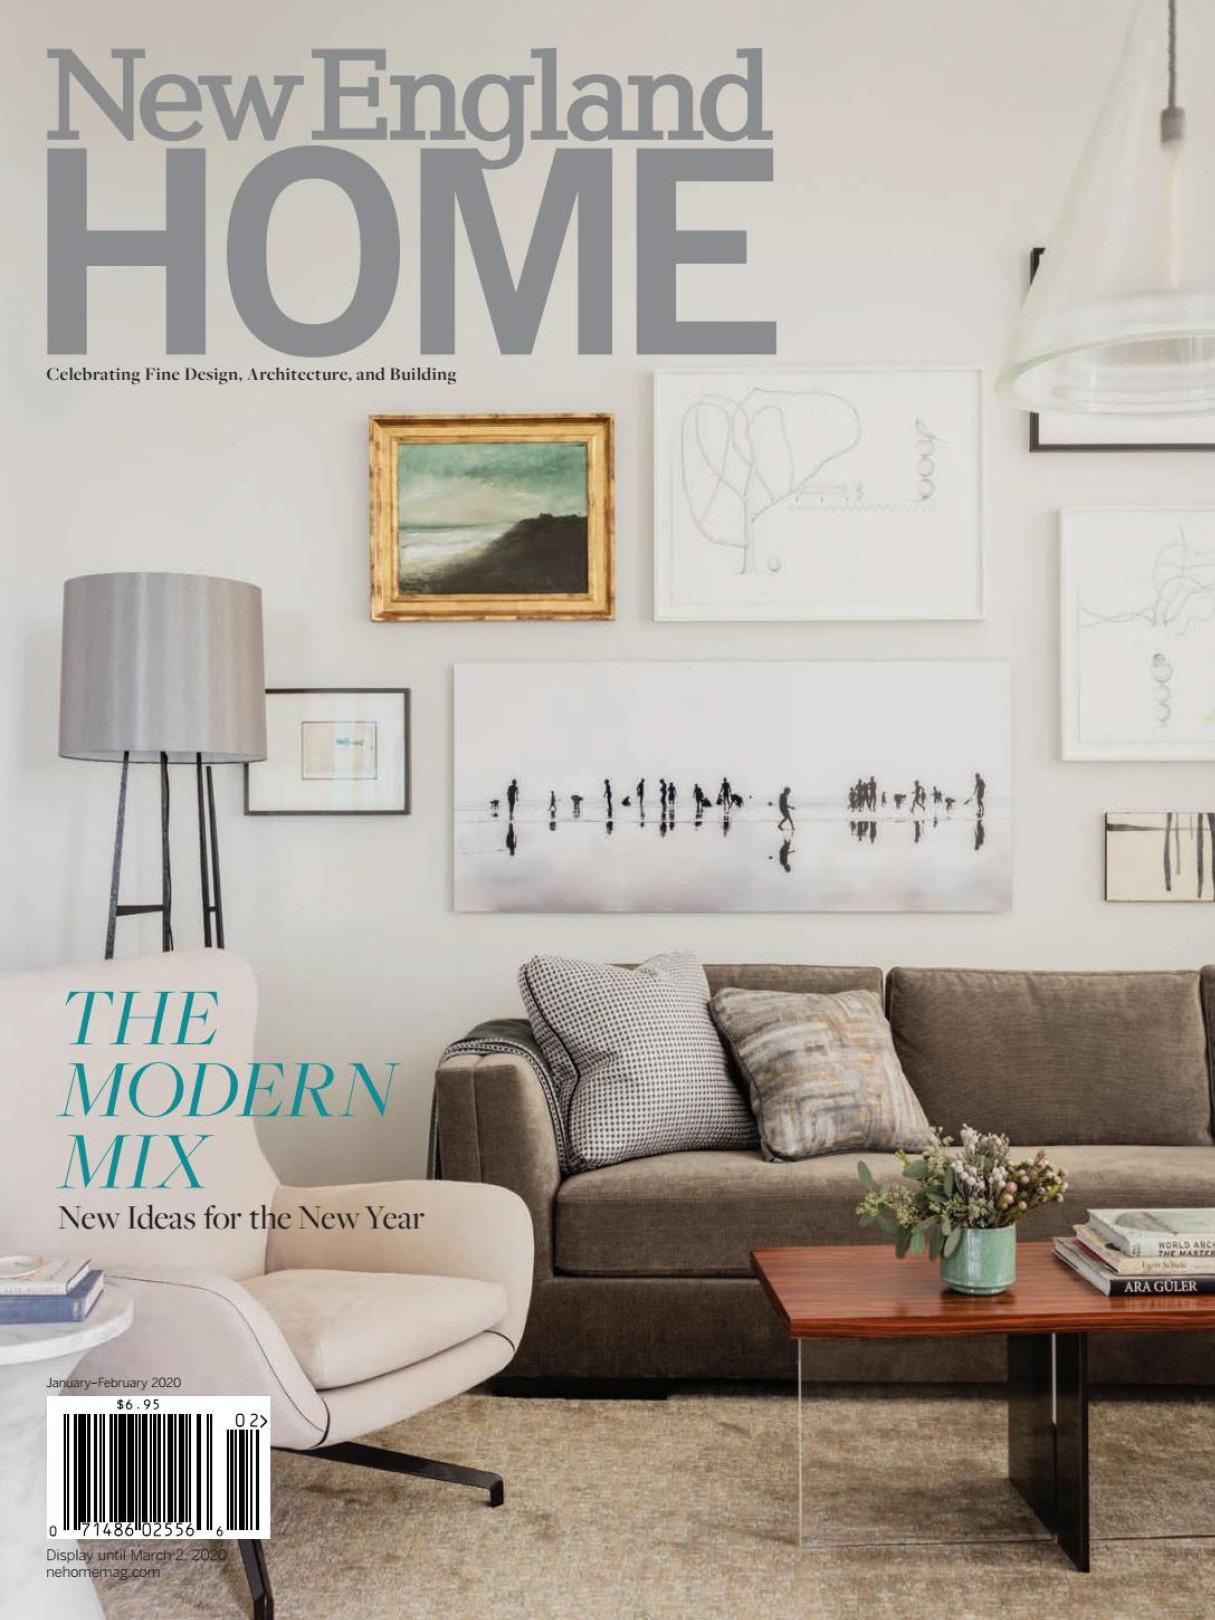 《New England Home》美国室内时尚杂志2020年01-02月号